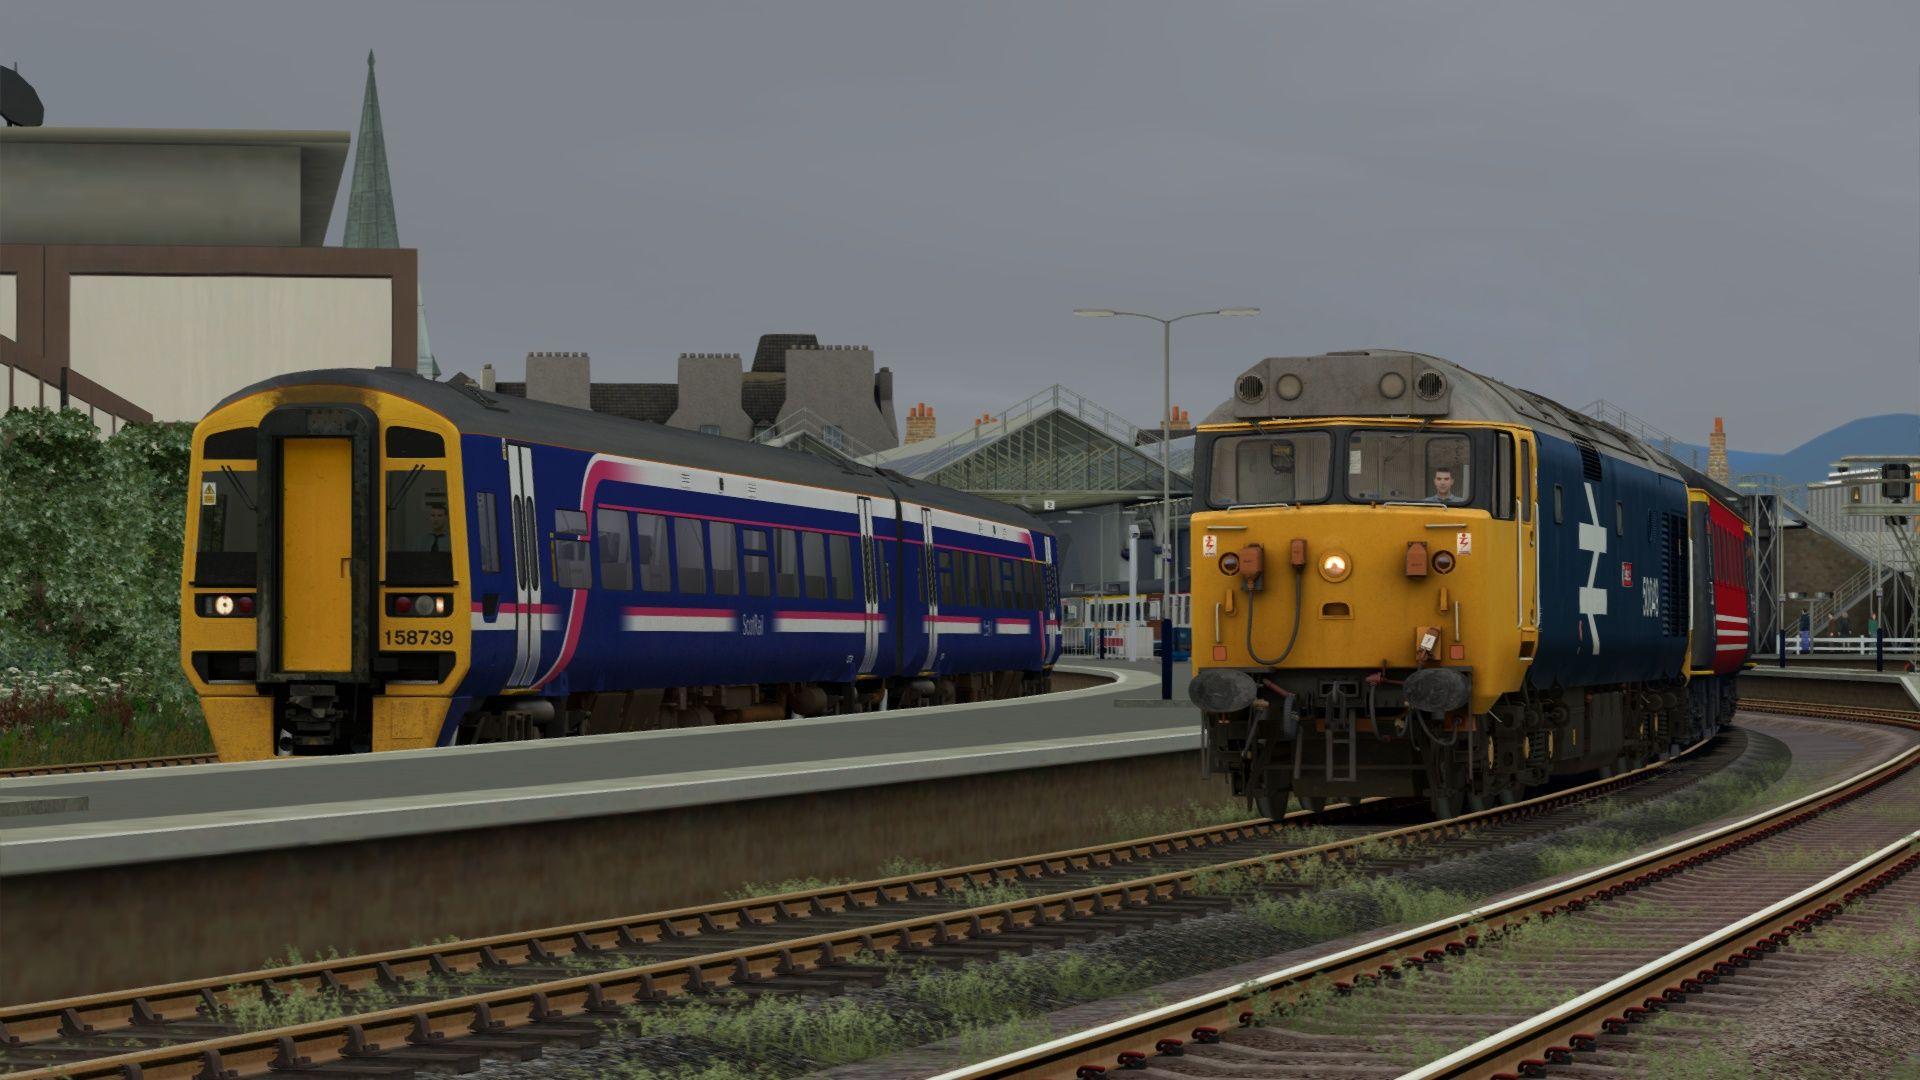 Screenshot_Just Trains - The Kyle Line_57.48155--4.21992_06-49-27.jpg